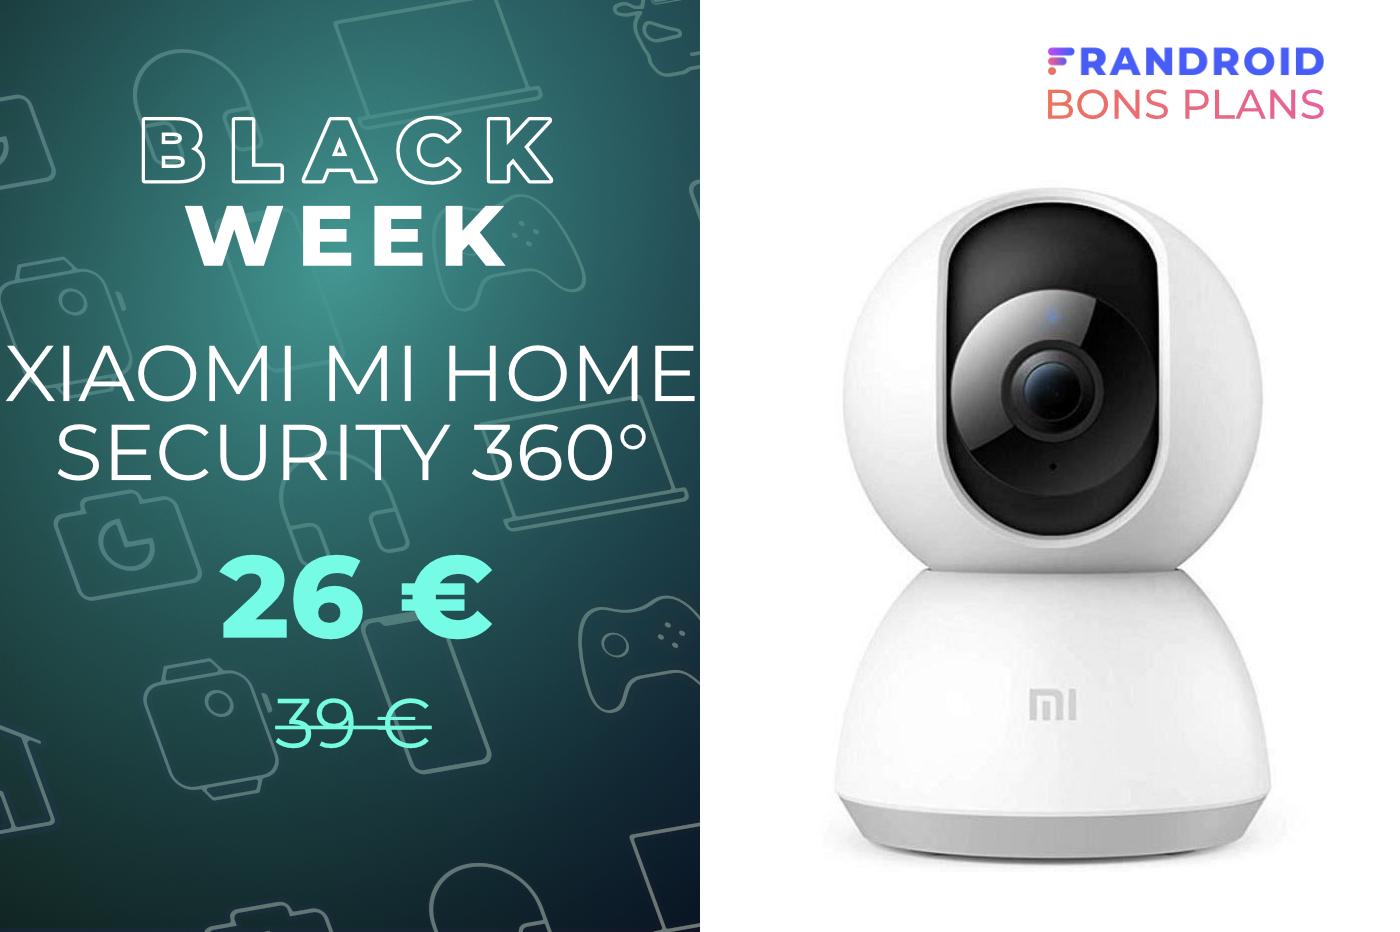 La caméra Xiaomi Mi Home Security 360° chute de nouveau à 26 euros